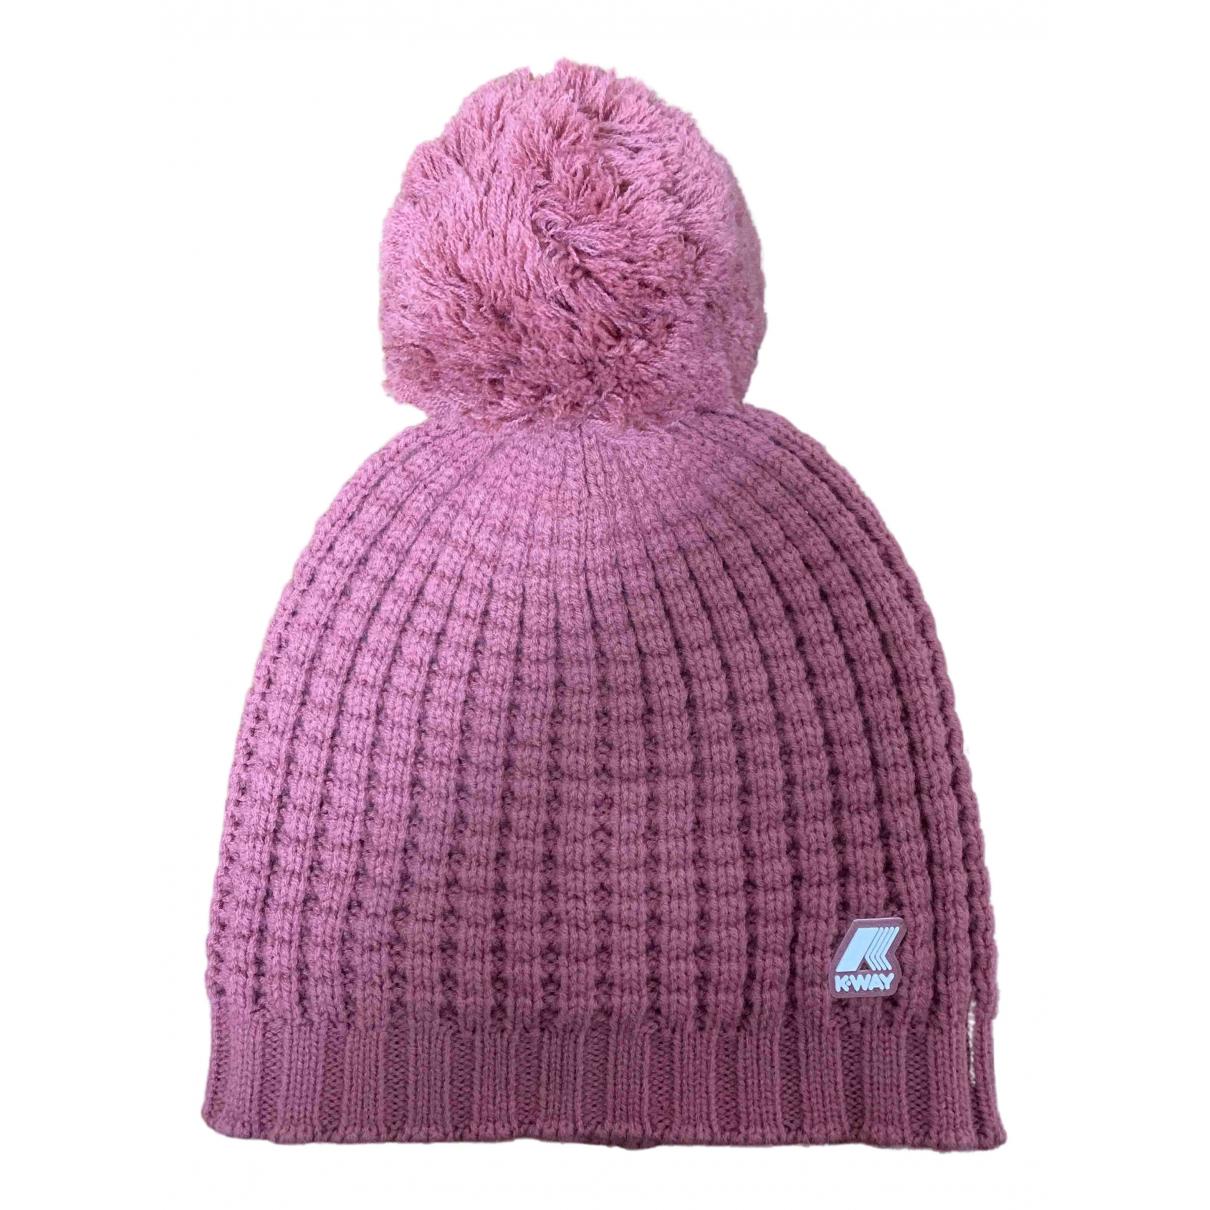 K-way N Pink hat for Women M International